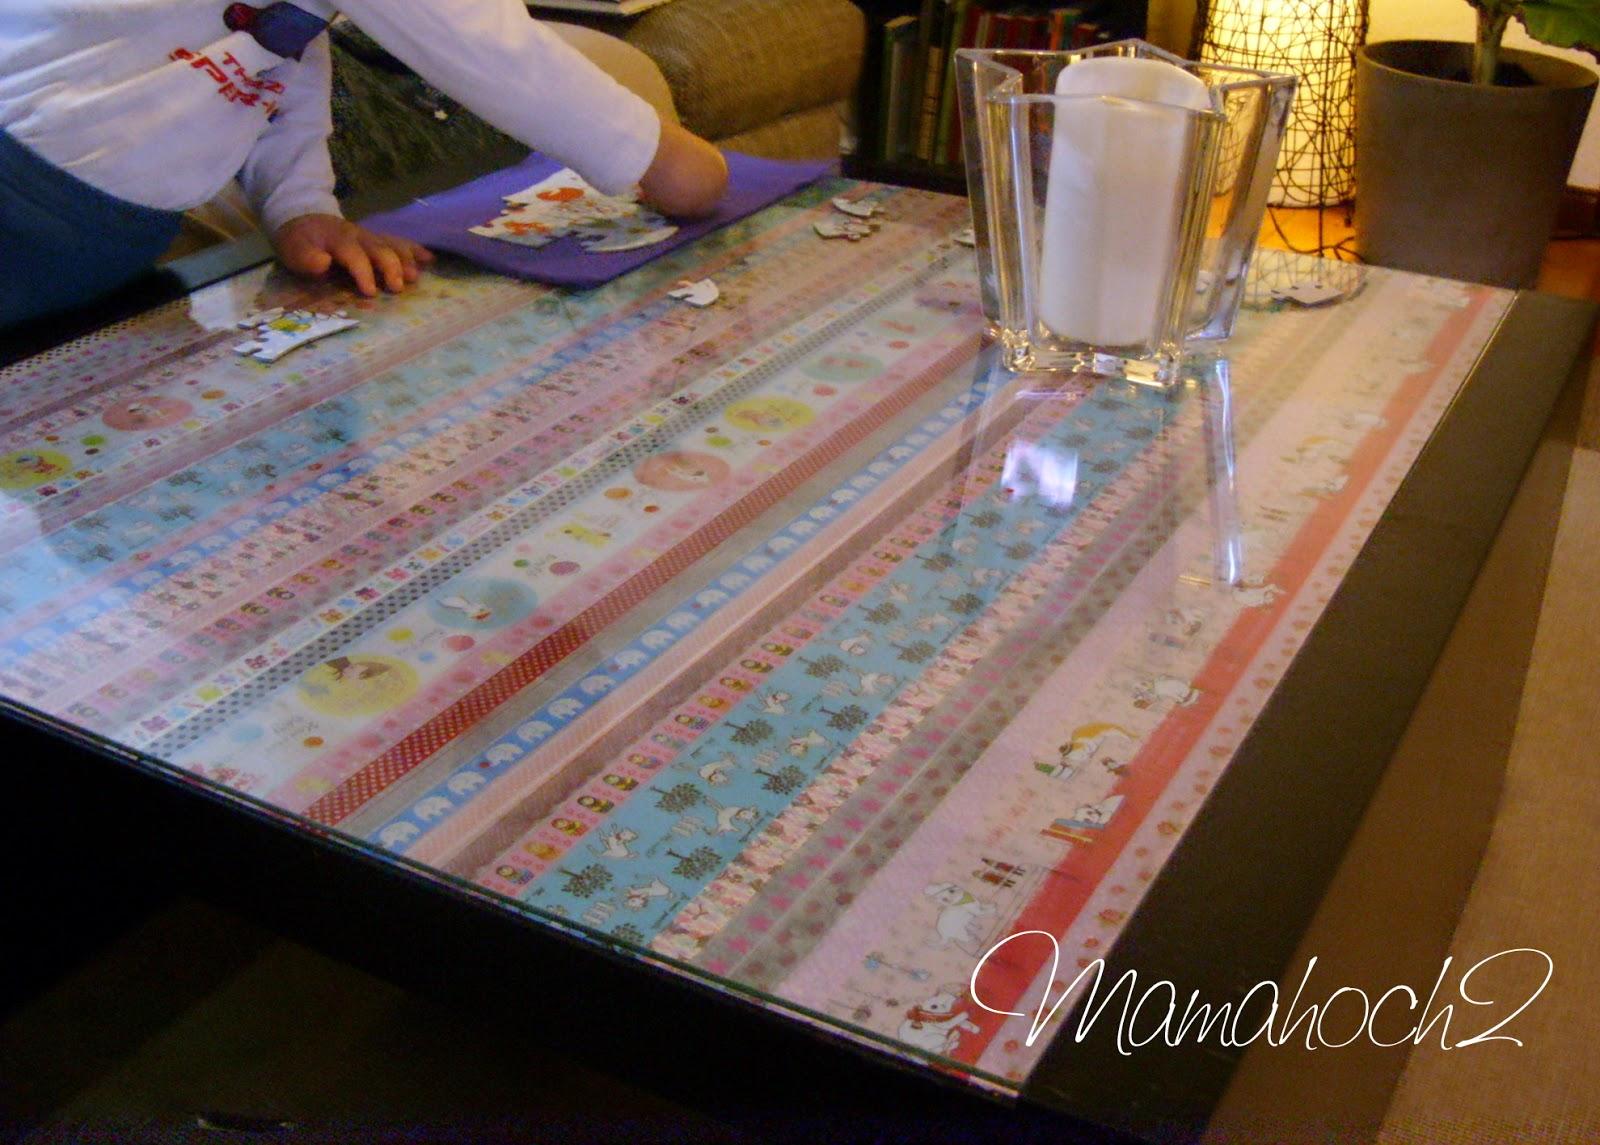 m bel upcycling masking tape ideen 1 der tisch mamahoch2. Black Bedroom Furniture Sets. Home Design Ideas